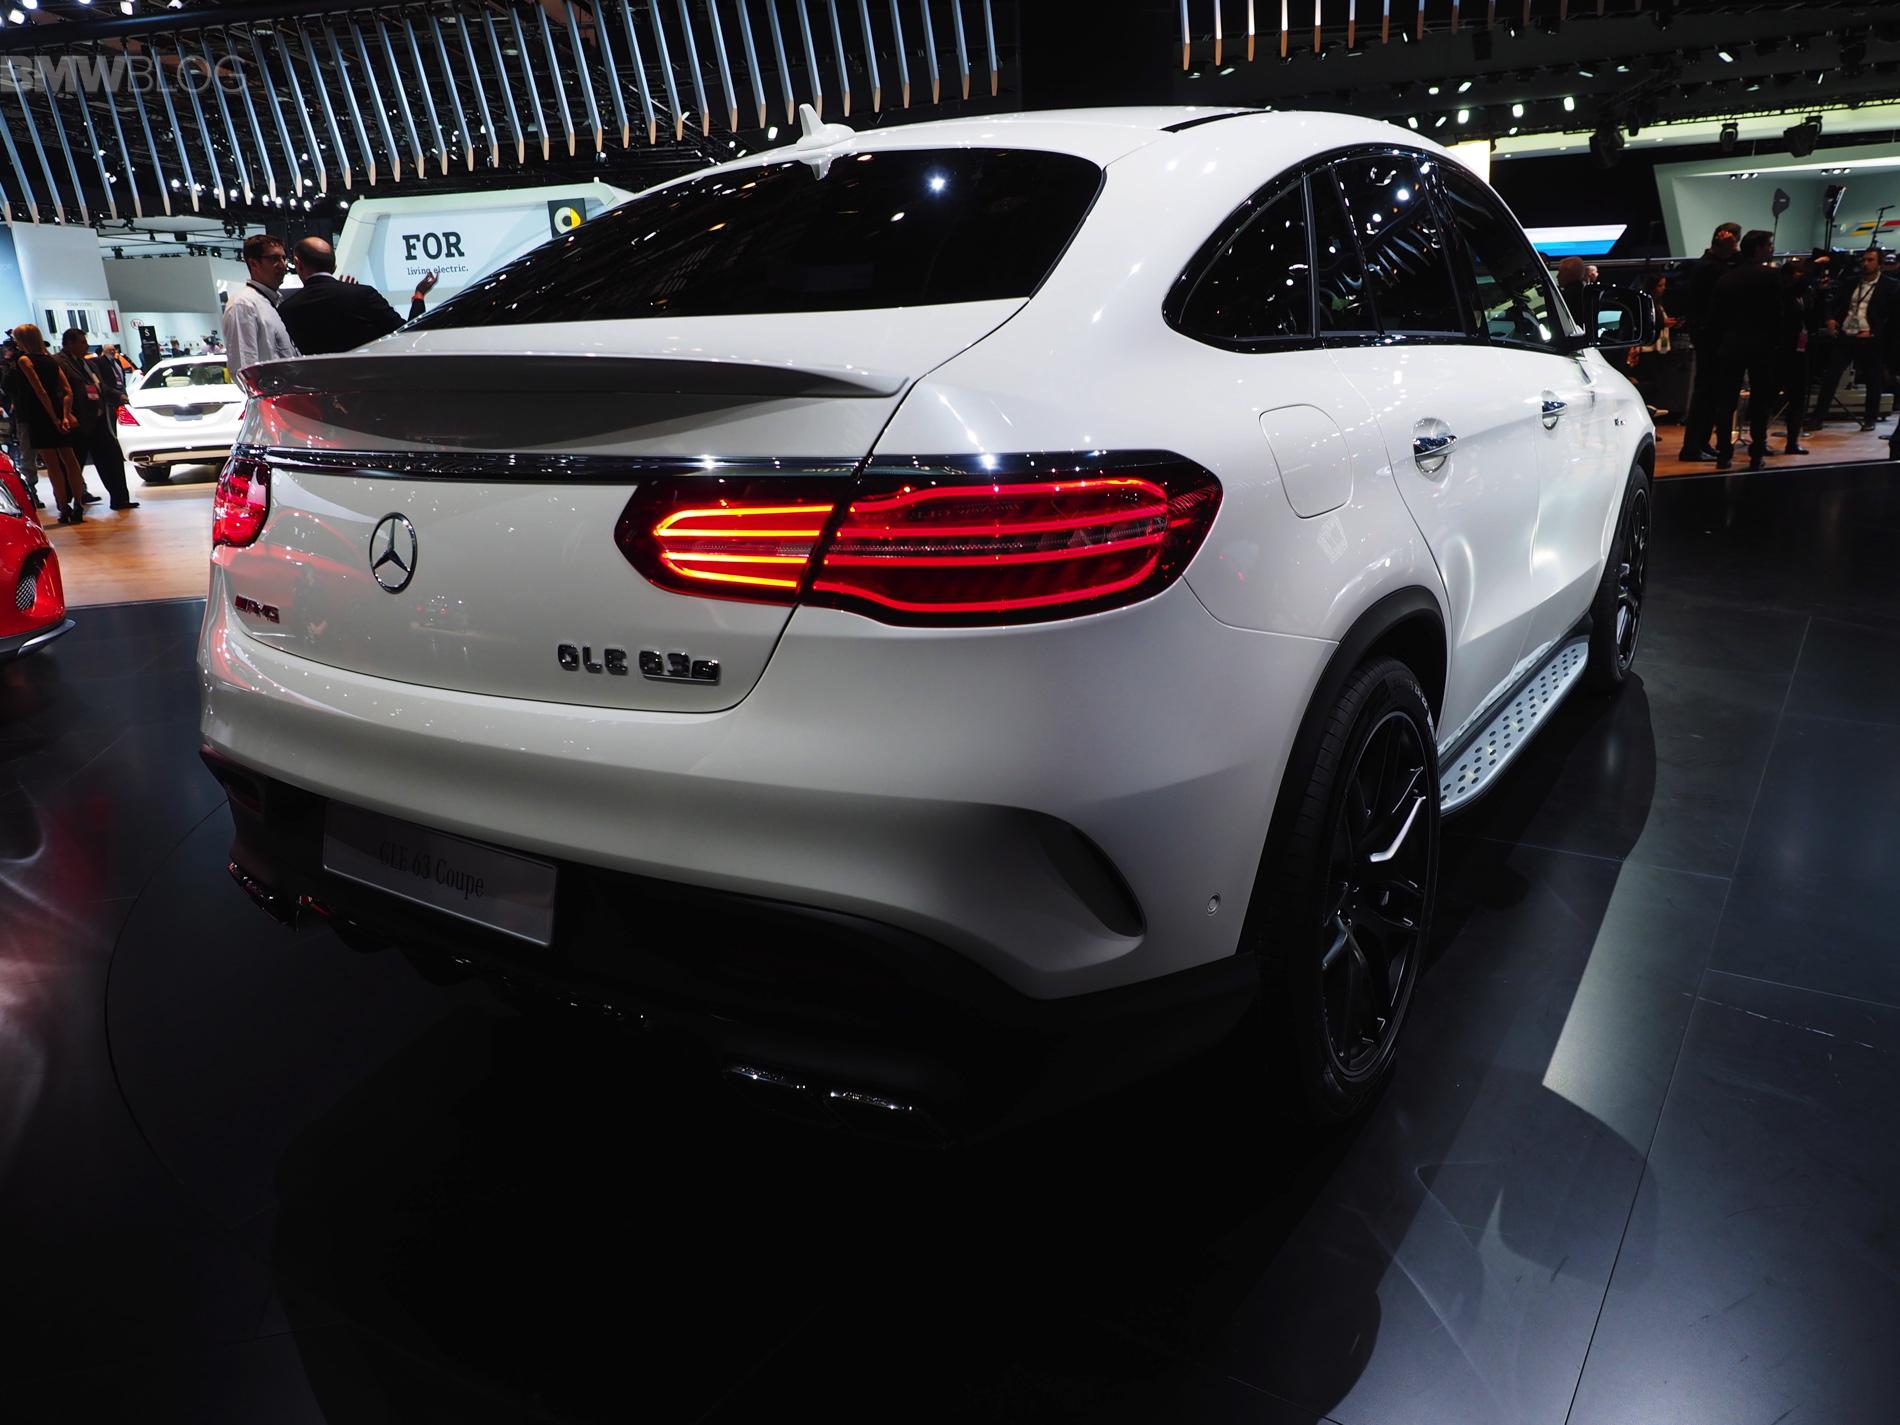 Bmw X6 0 60 >> Mercedes-Benz GLE debut at 2015 Detroit Auto Show